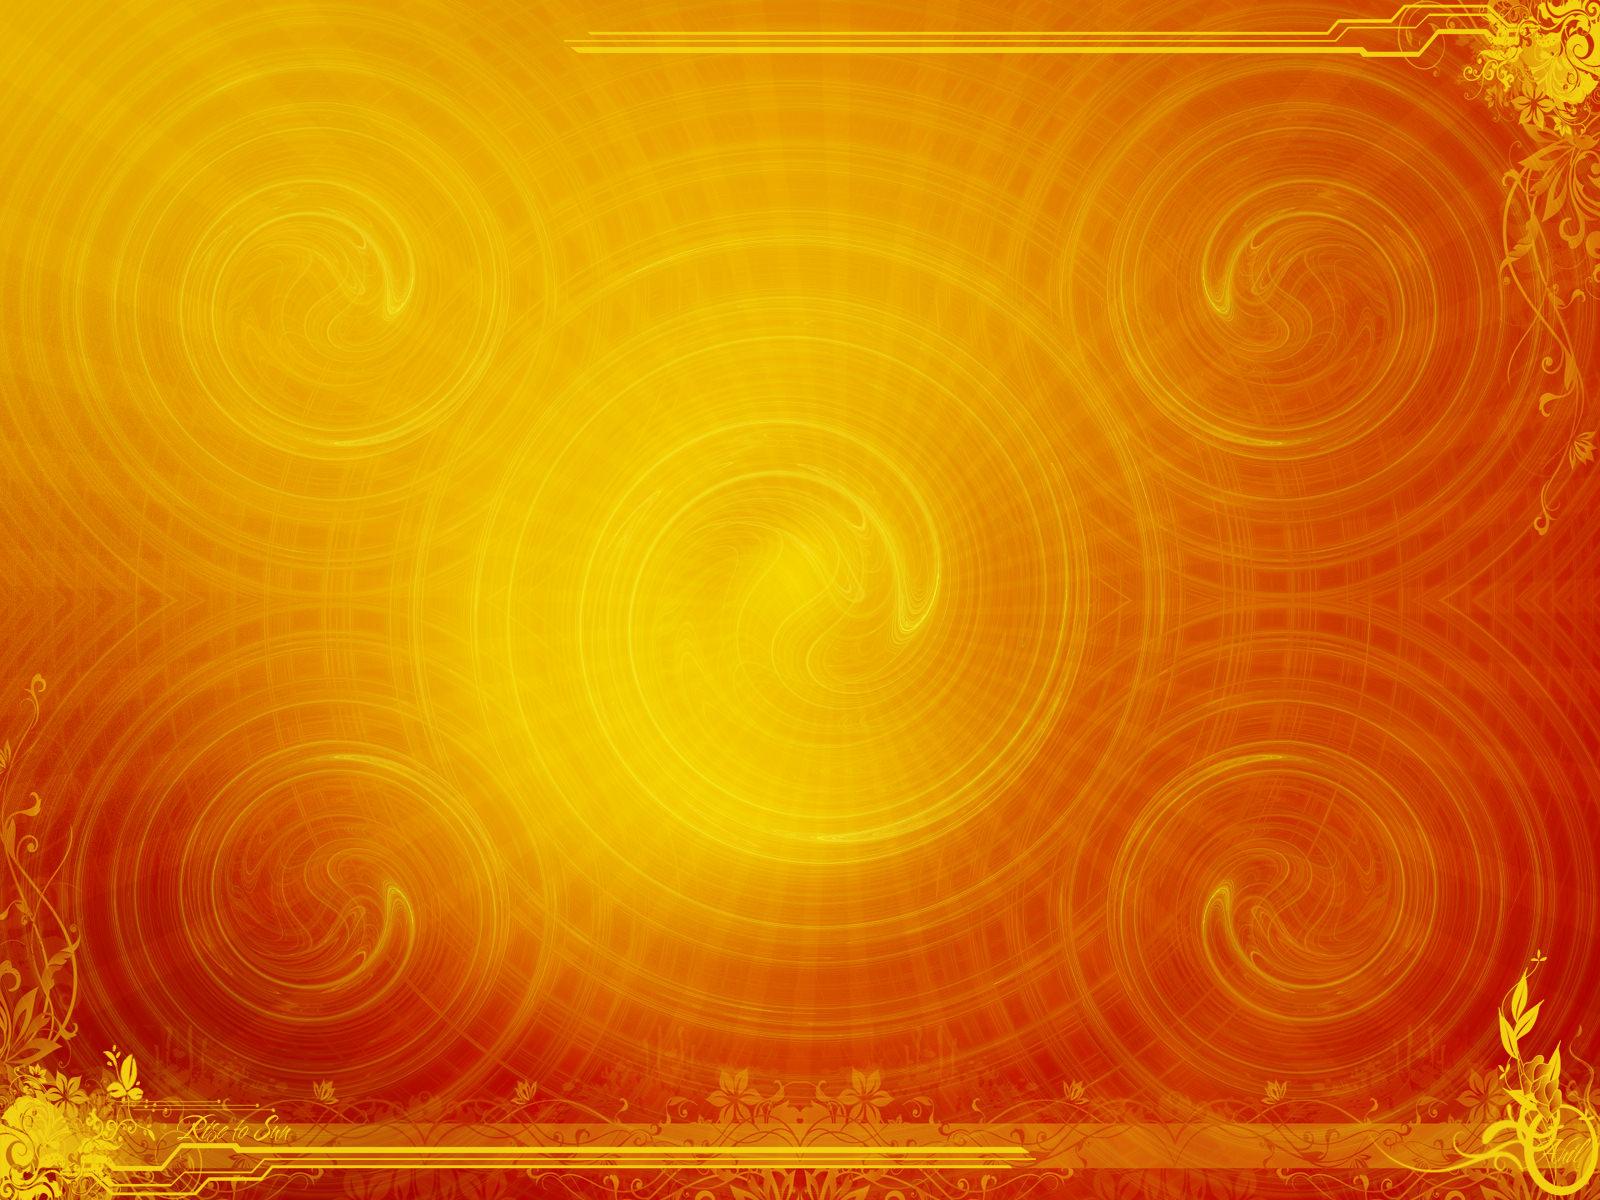 Abstract Yellow Swirls Wallpaper